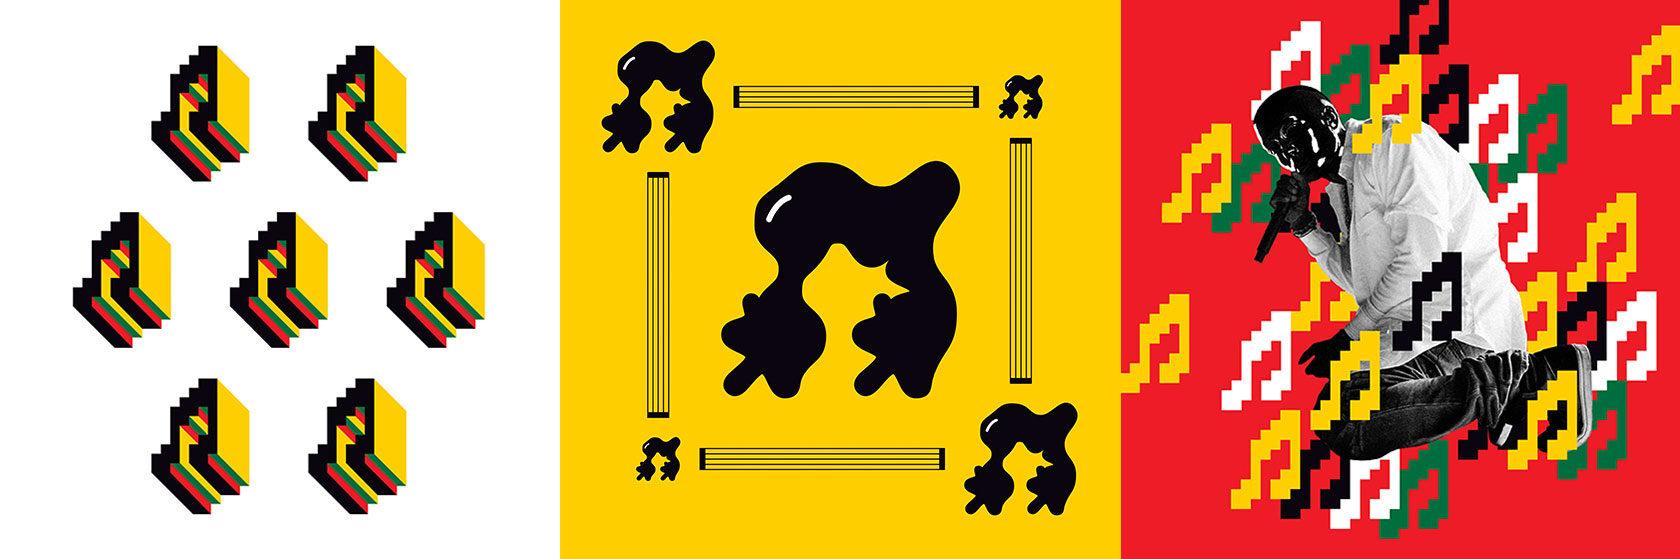 Artistree-social-media-design3-by-Furia